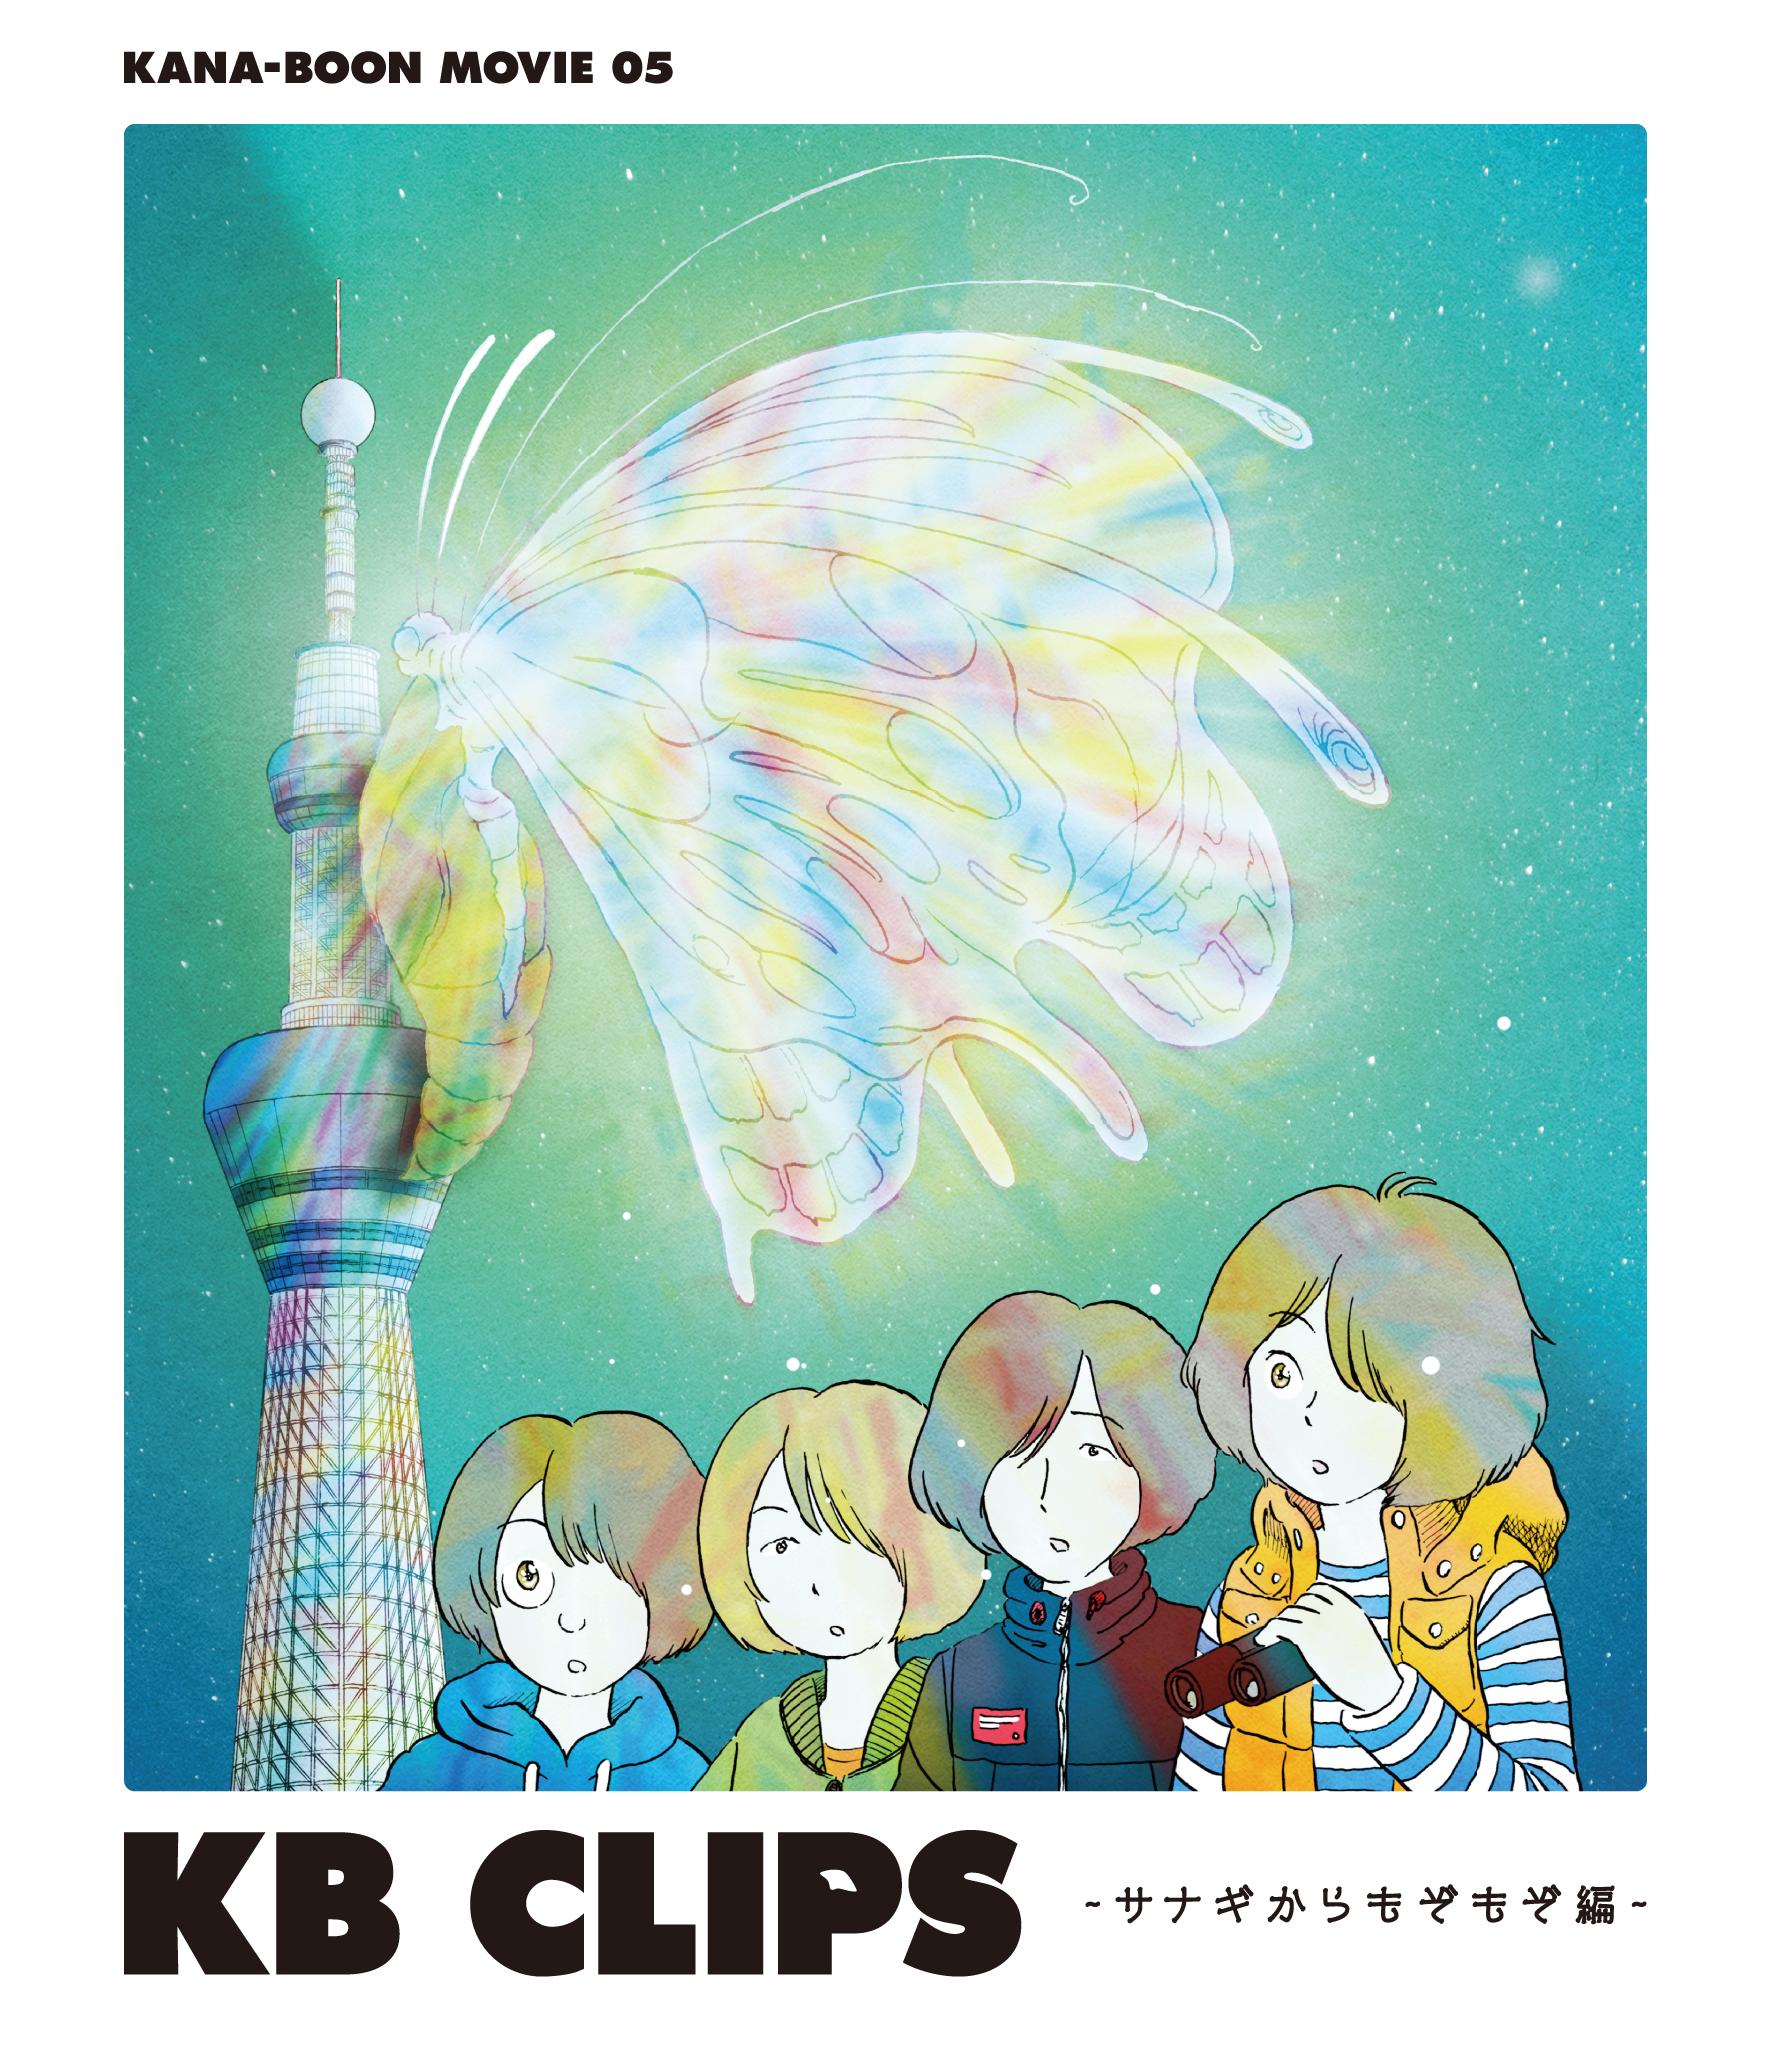 KANA-BOON MOVIE 05 / KB CLIPS ~サナギからもぞもぞ編~